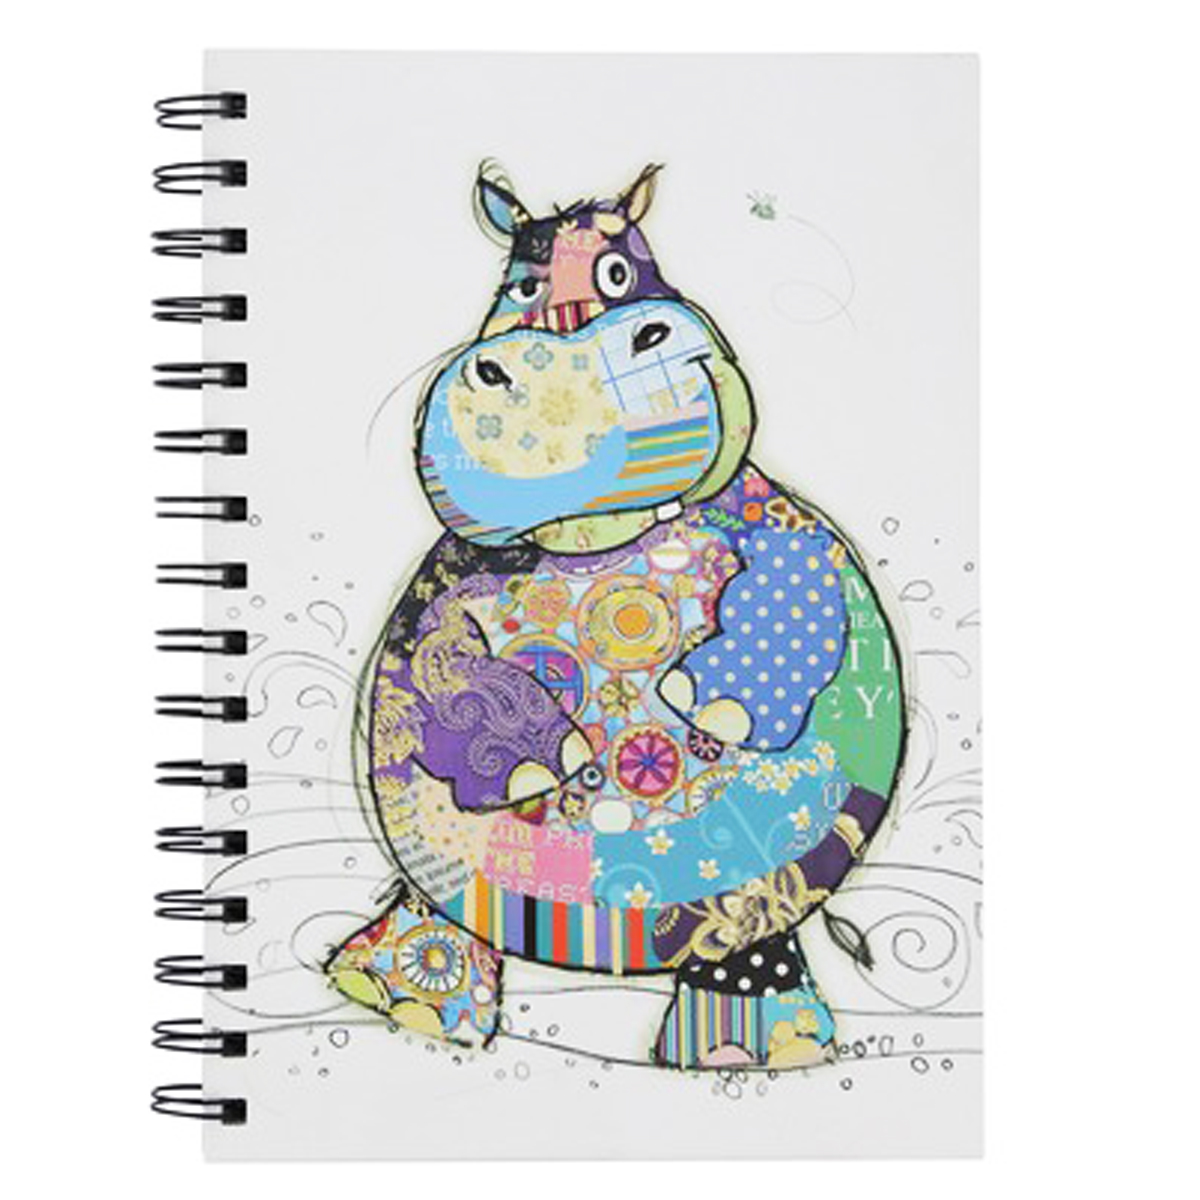 Carnet à spirales A6 \'Bug Art\' multicolore (Hippopotame Harry) - 145x105x12 cm - [Q2812]